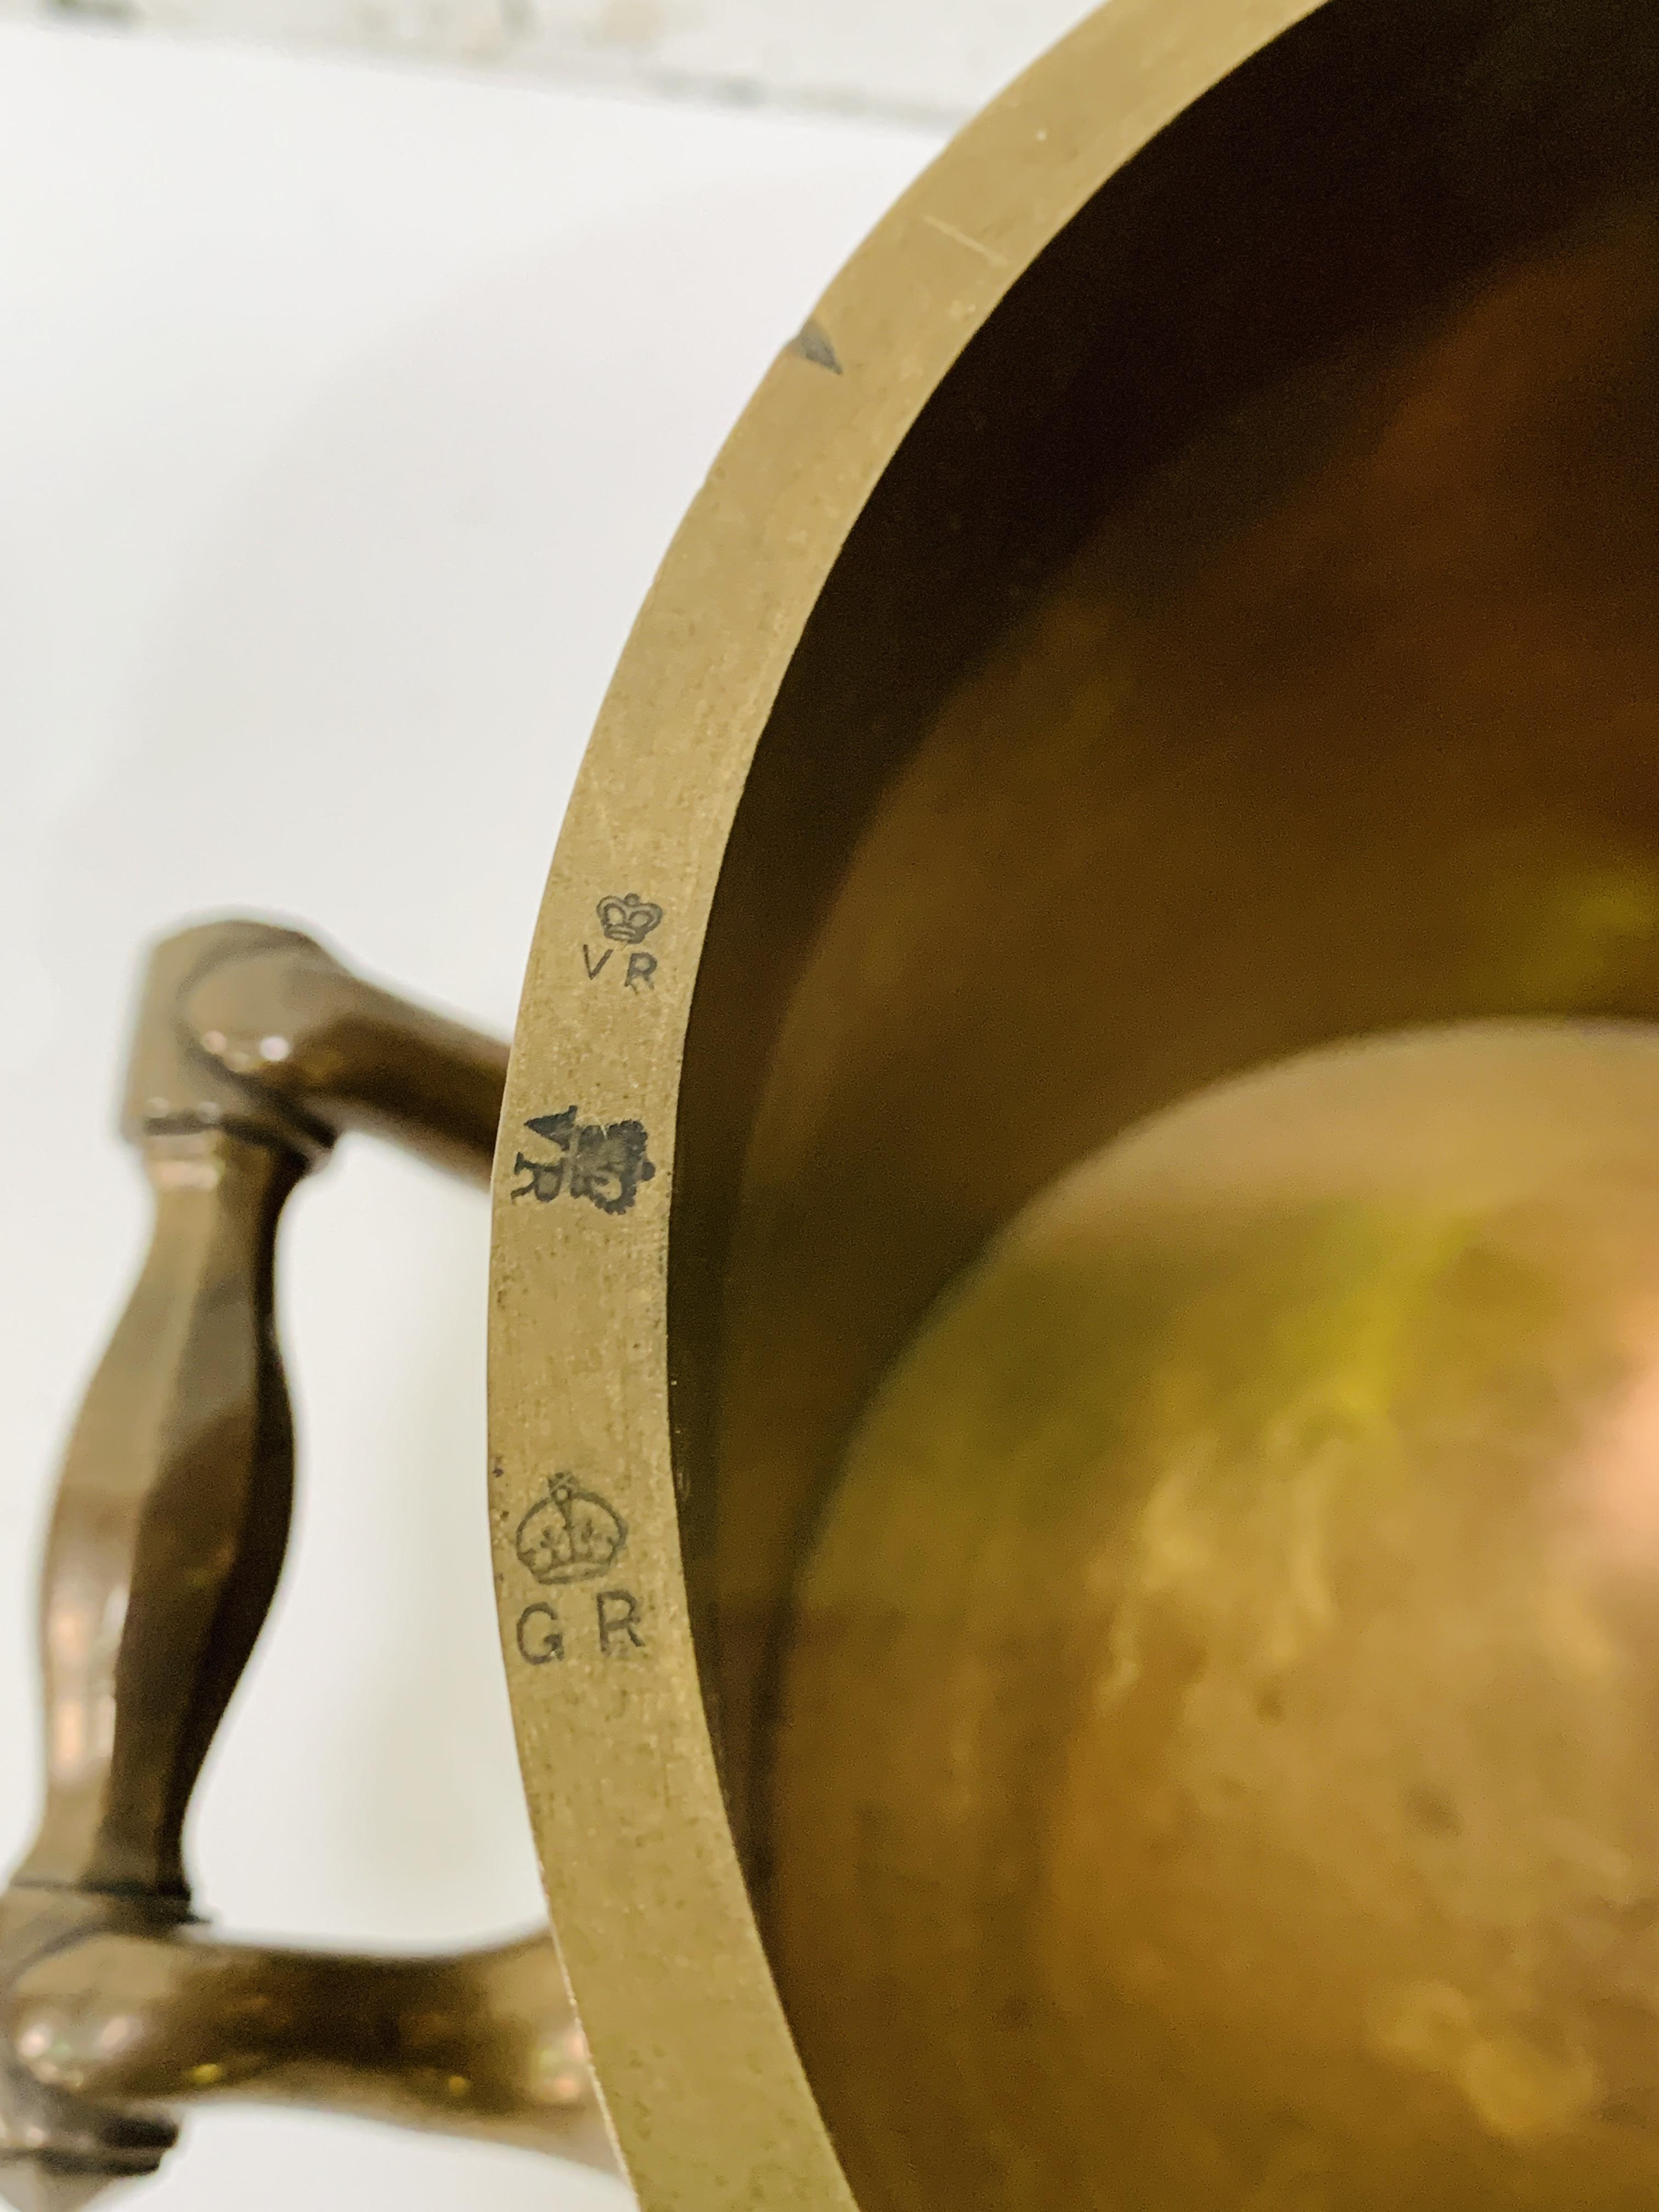 Imperial half bushel bronze measure - Image 6 of 6